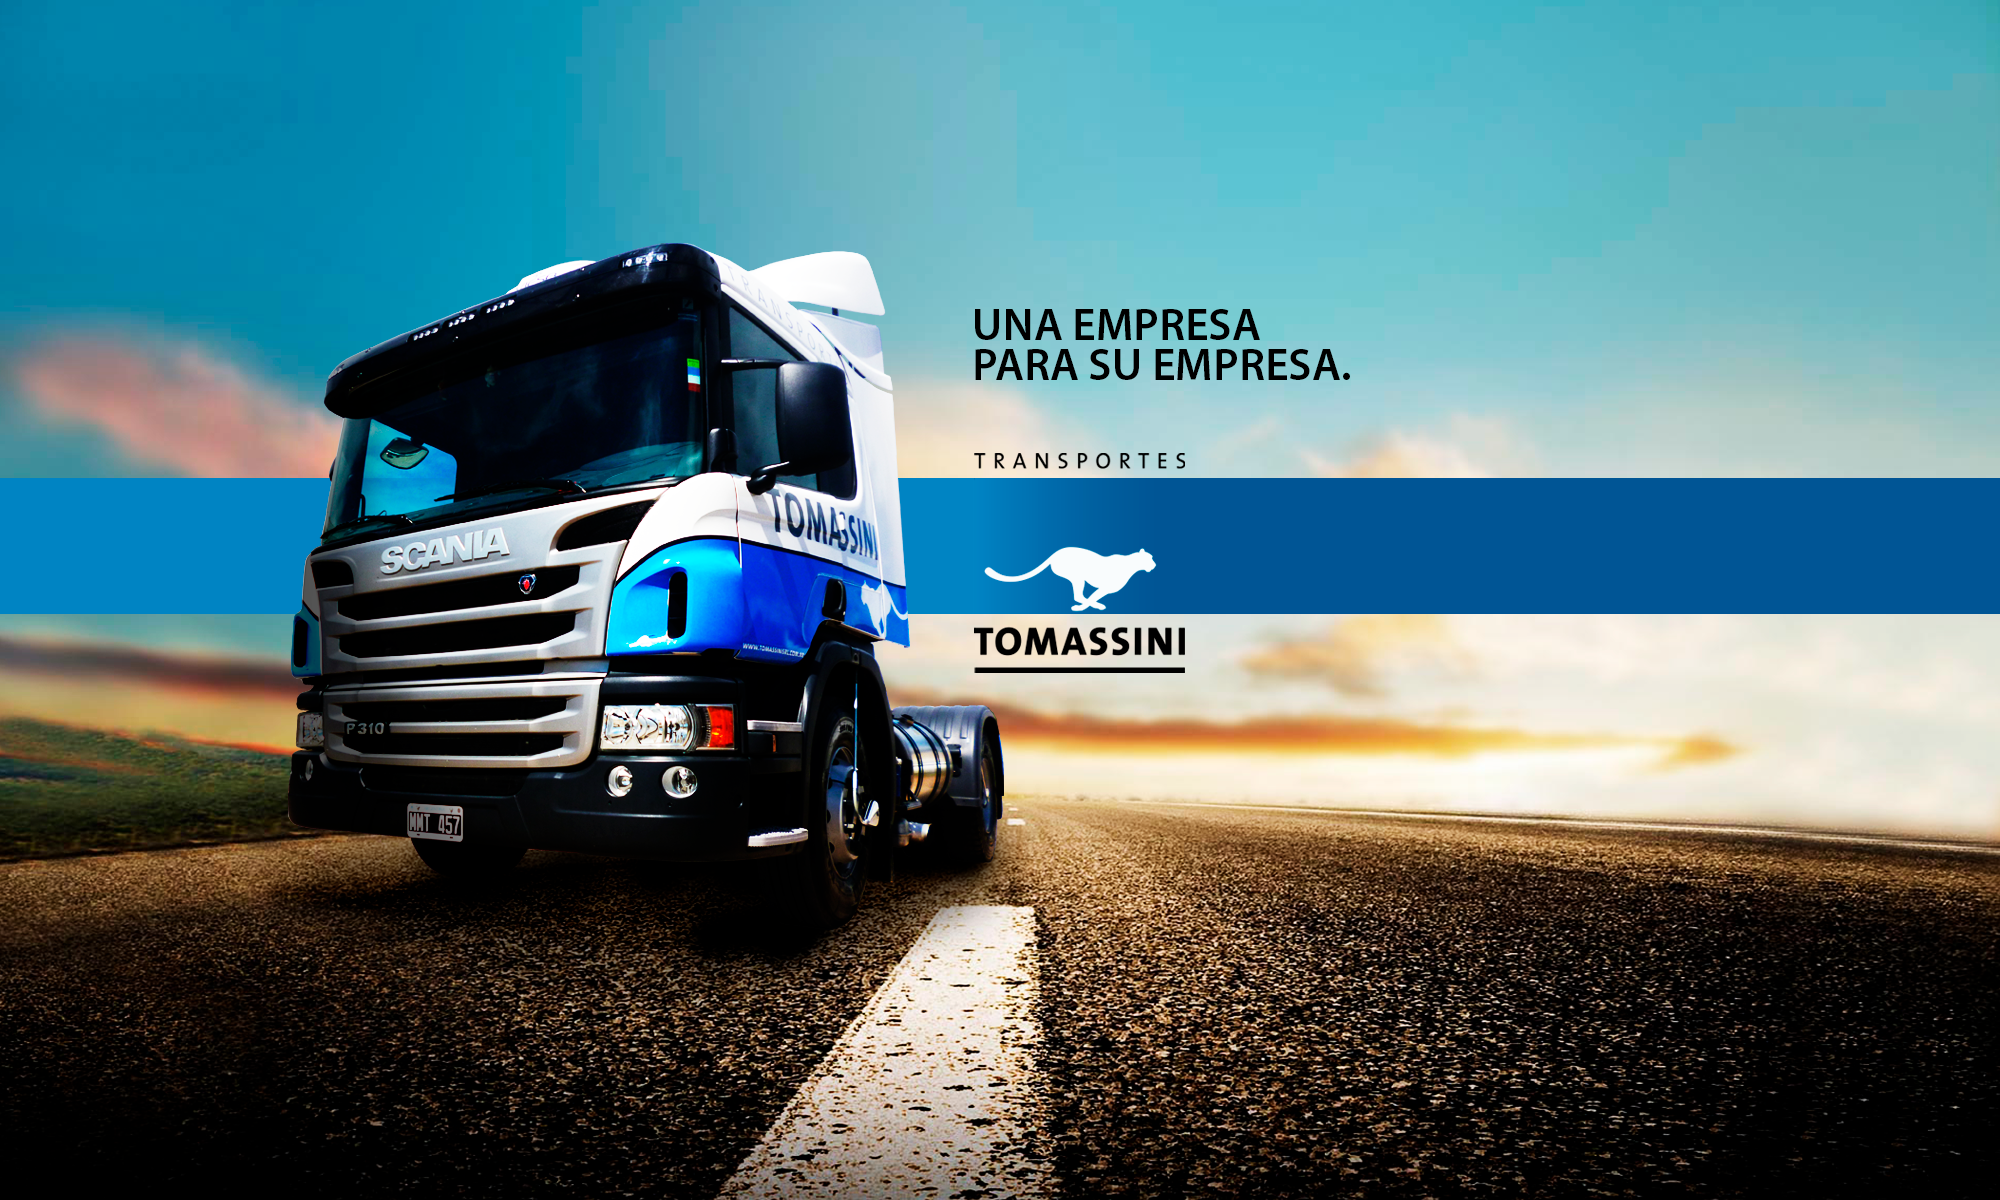 Transportes Tomassini